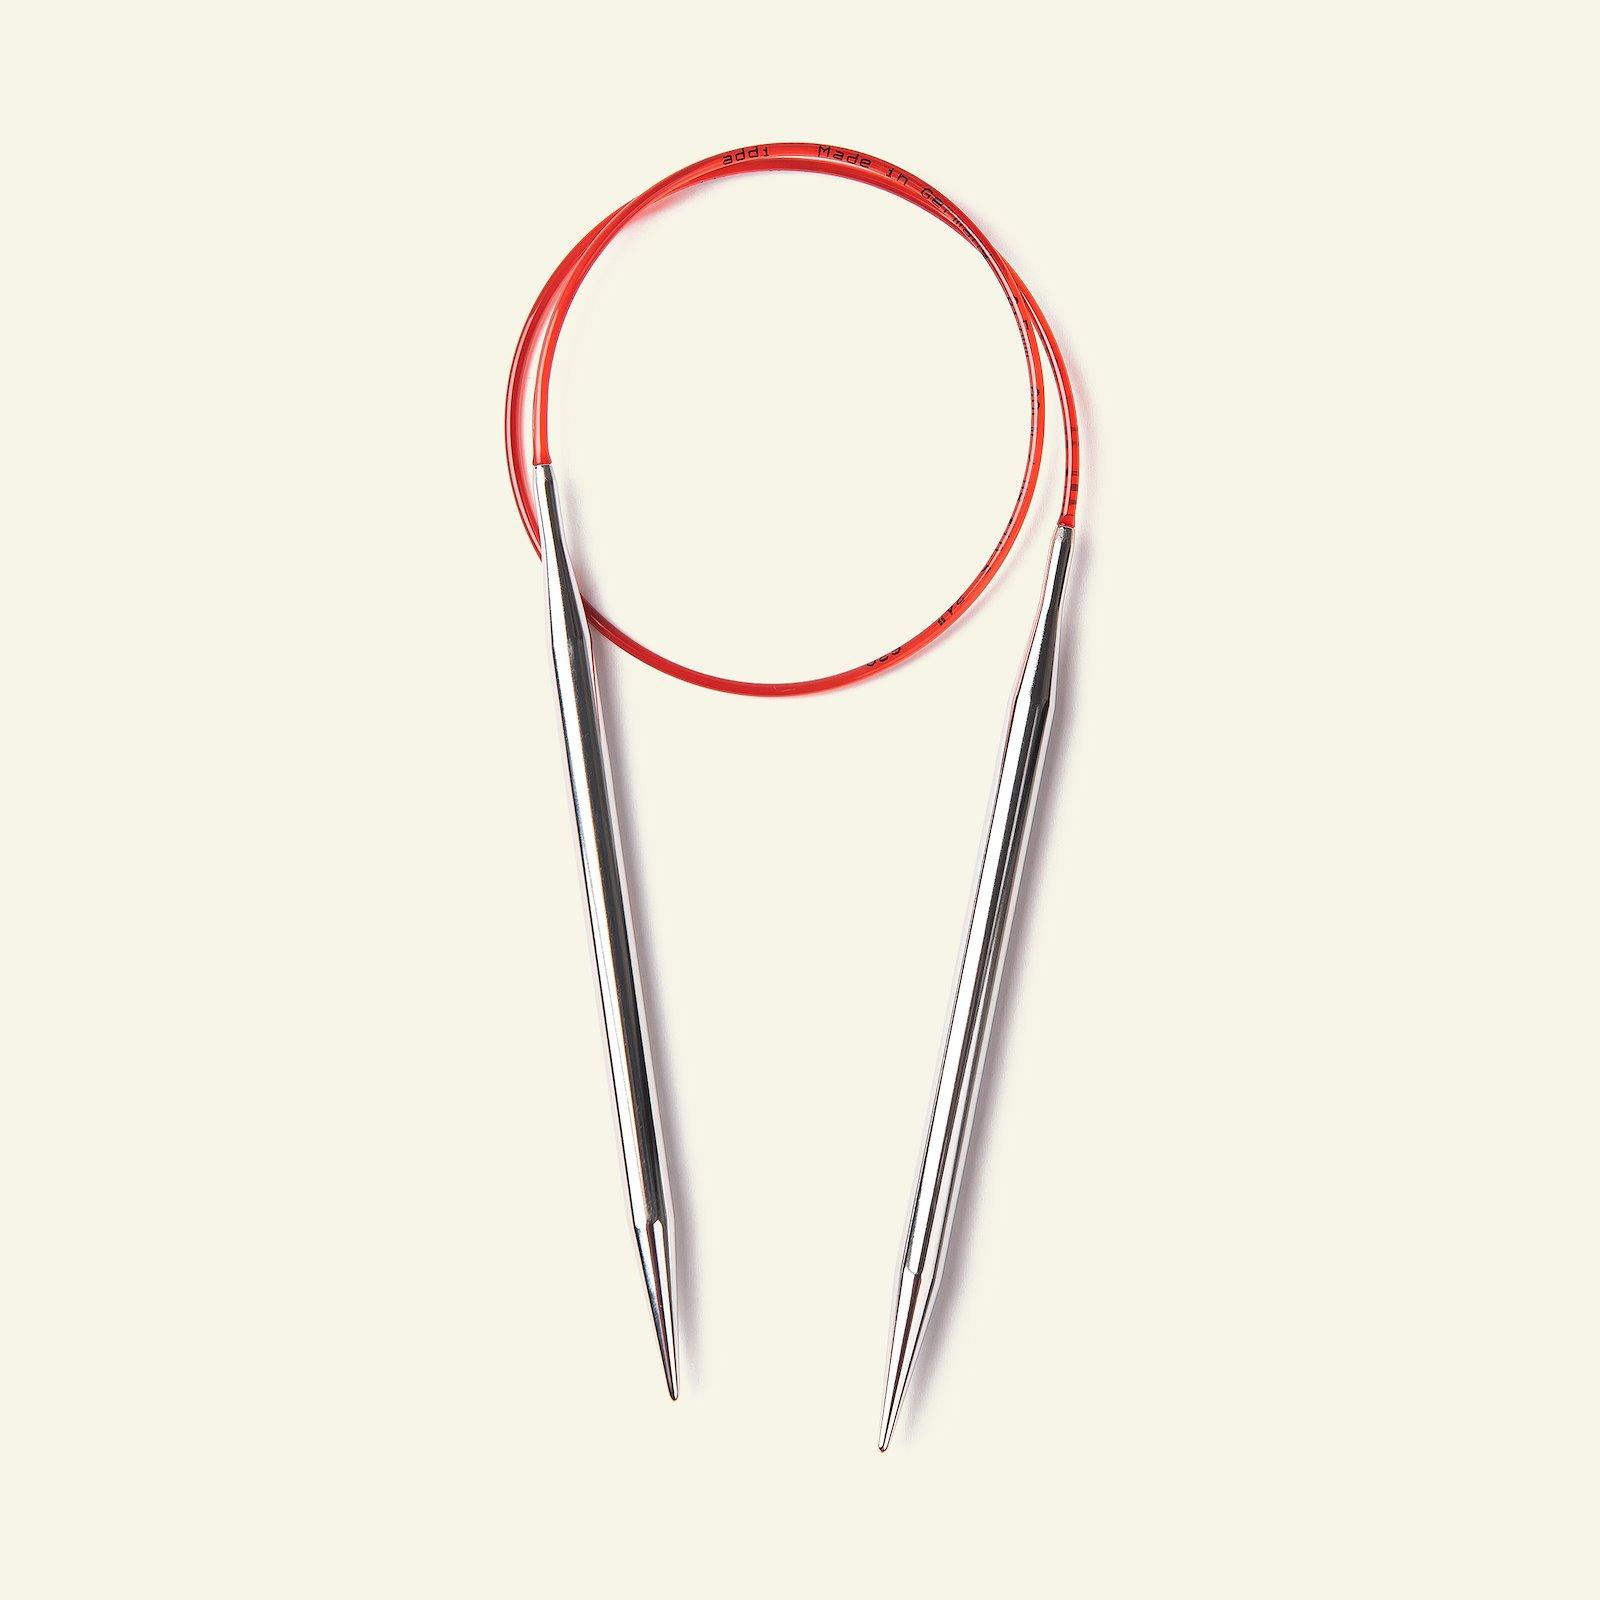 Addi Lace circular needle 60cm 5,5mm 83222_pack